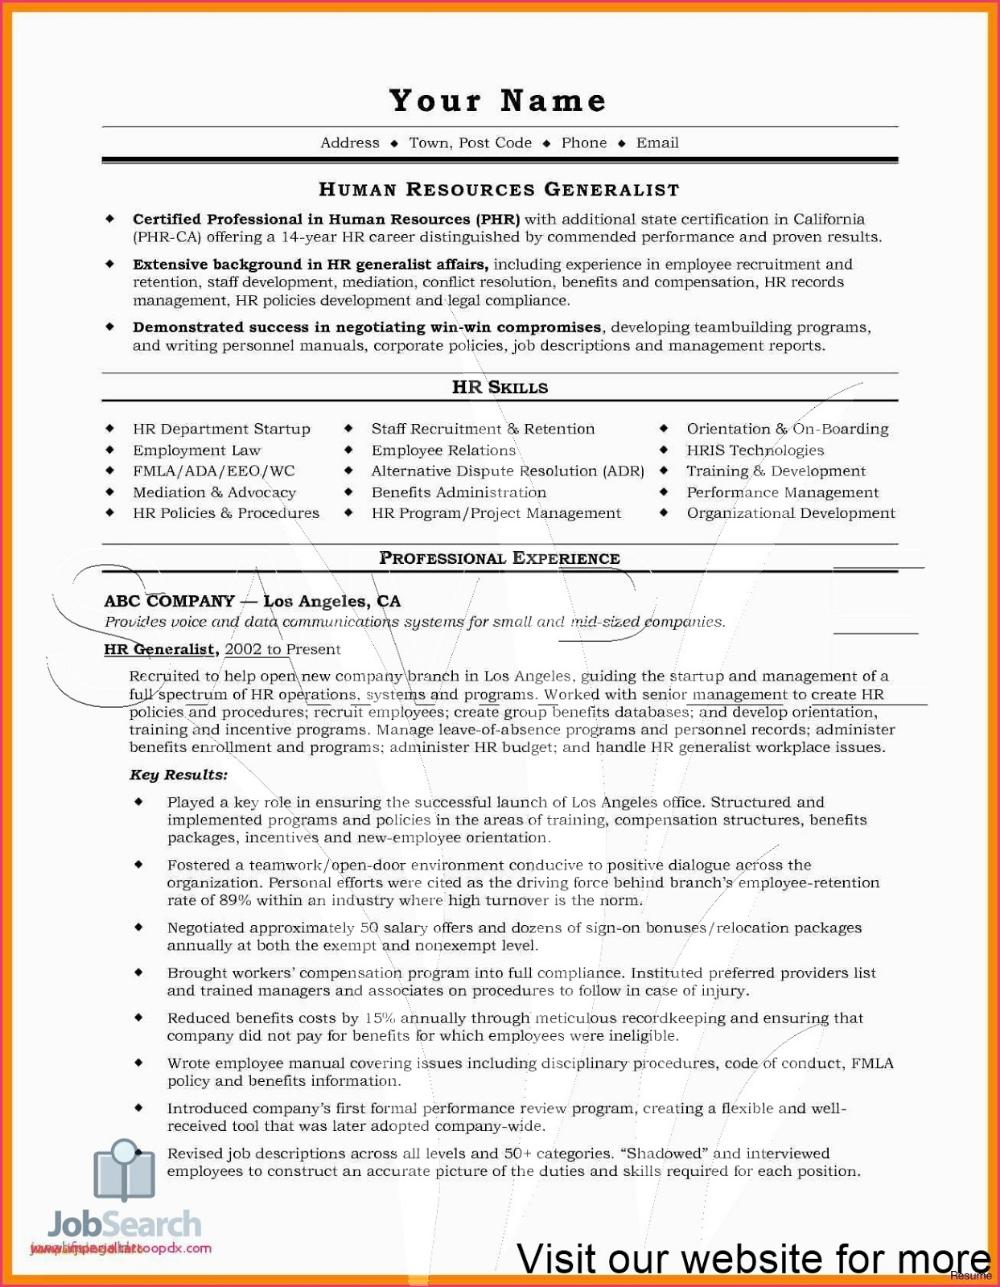 Sample Child Care Resume Objectives Australia 2020